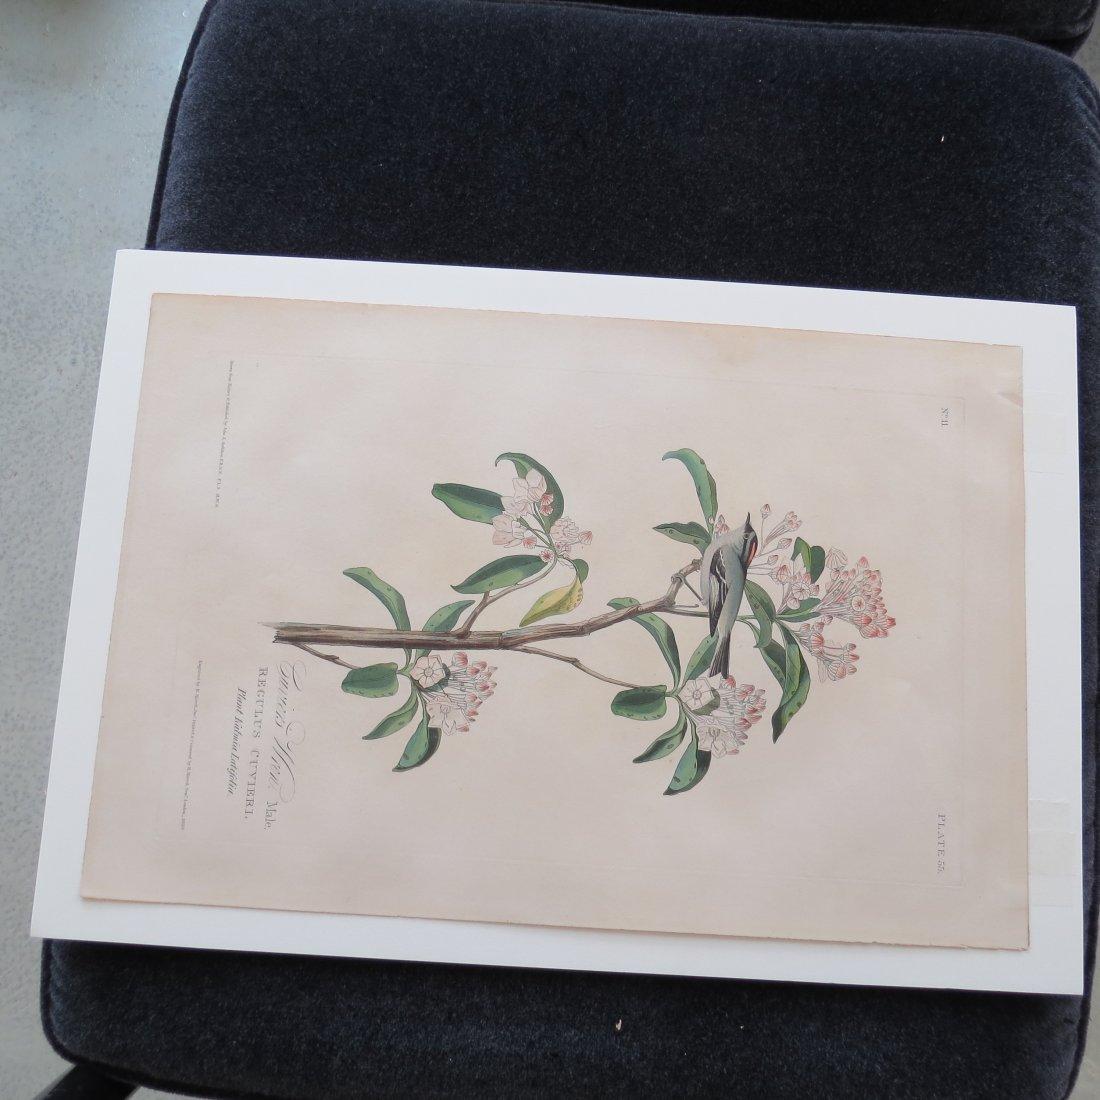 John James Audubon (American, 1785-1851) Cuvier's Wren, - 2